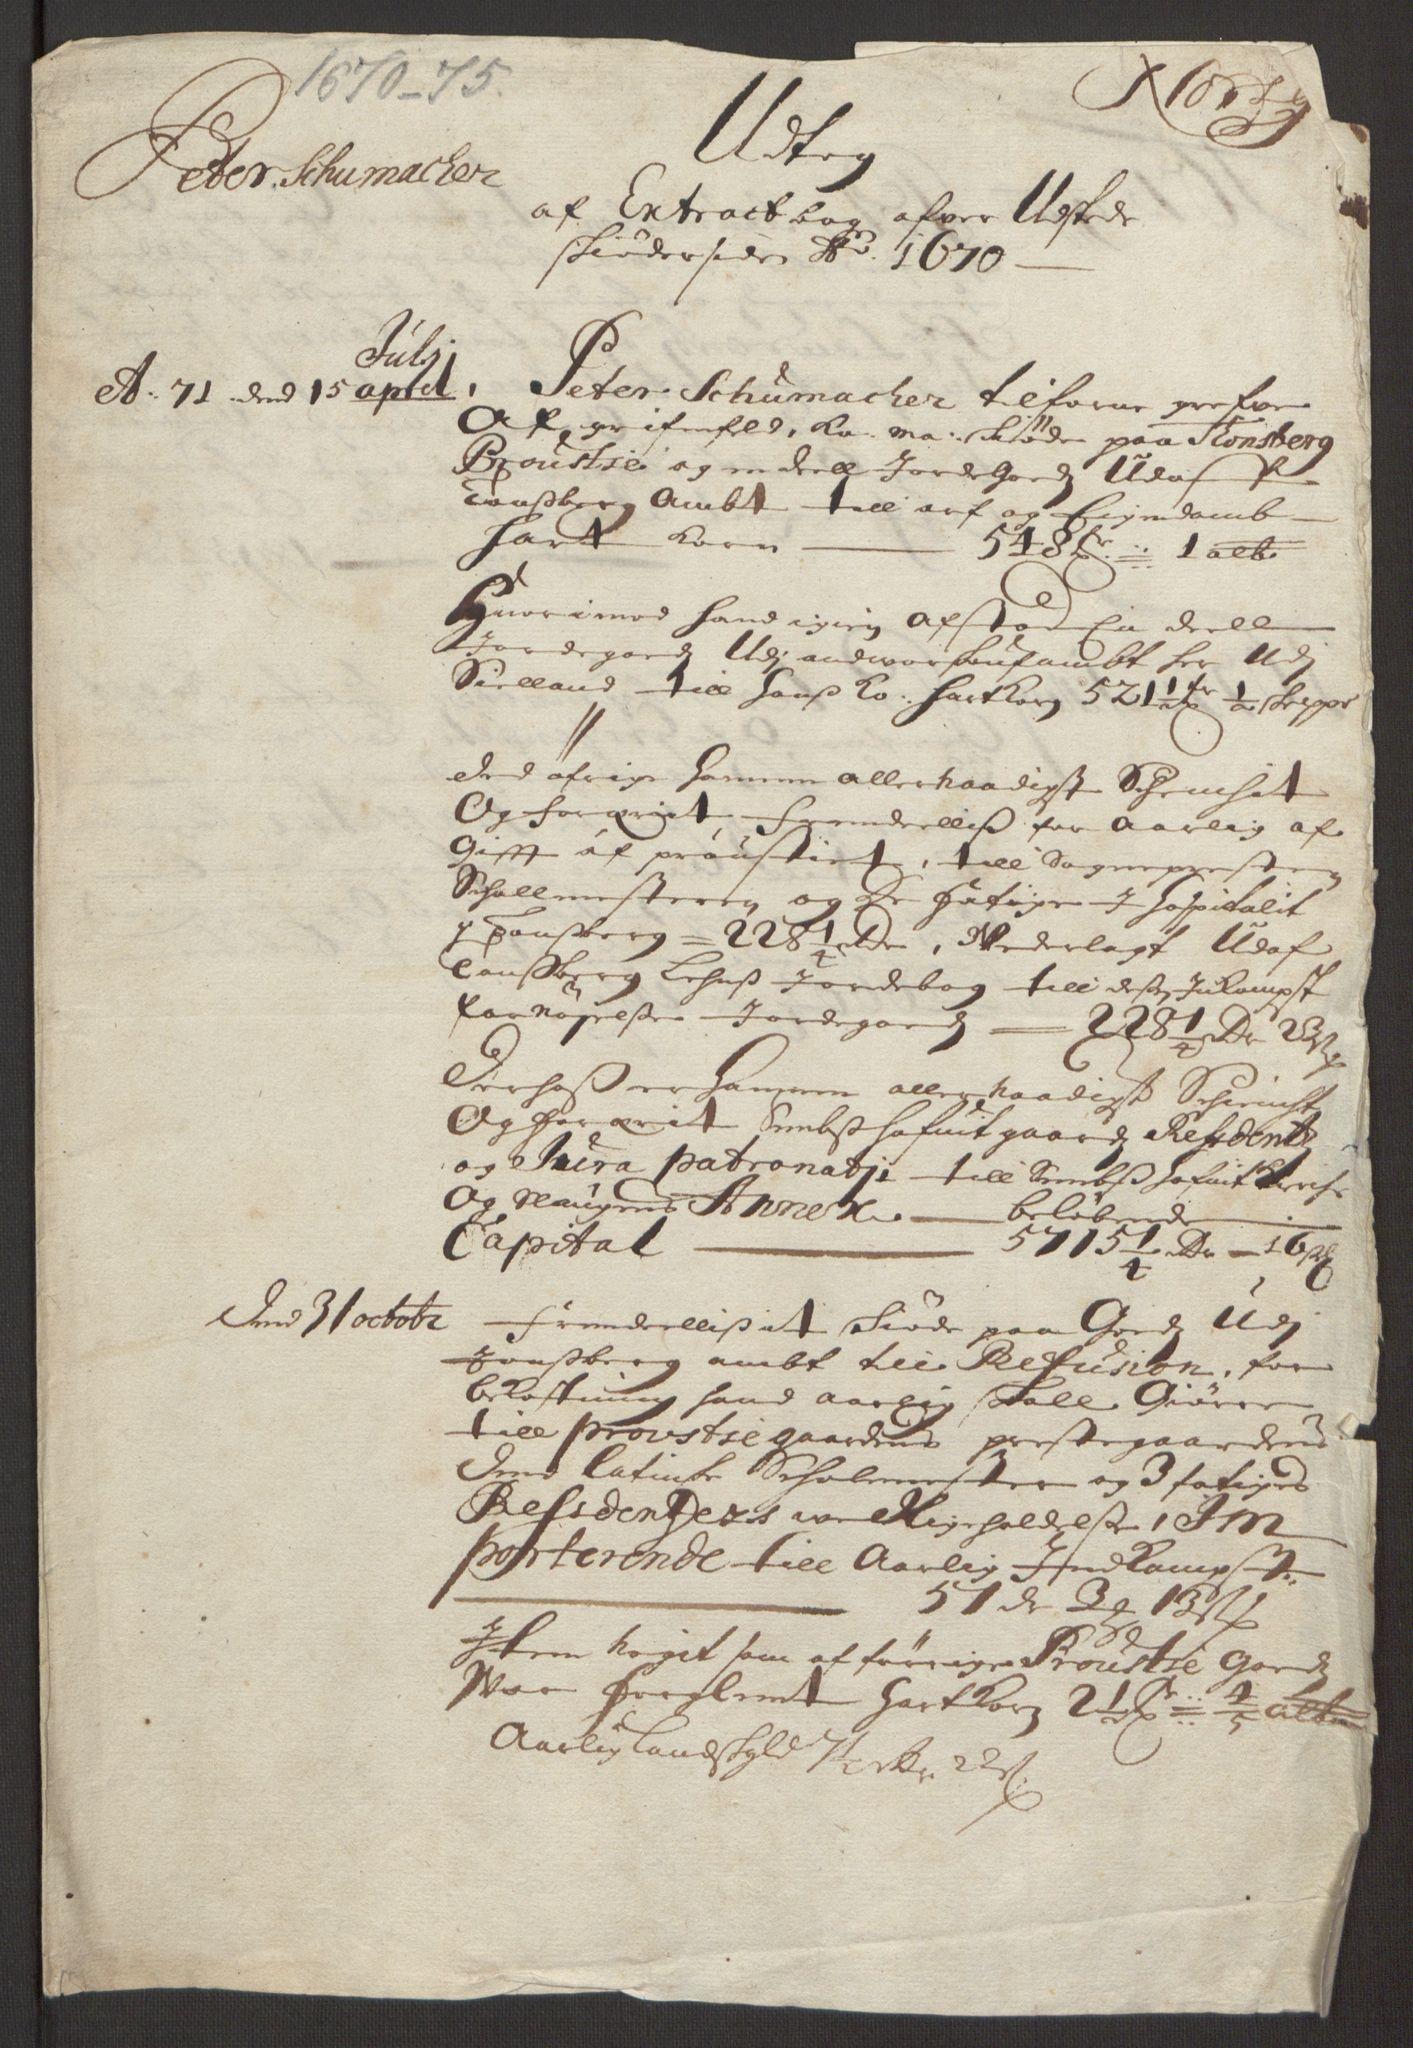 RA, Rentekammeret inntil 1814, Reviderte regnskaper, Fogderegnskap, R32/L1844: Fogderegnskap Jarlsberg grevskap, 1674-1675, s. 379